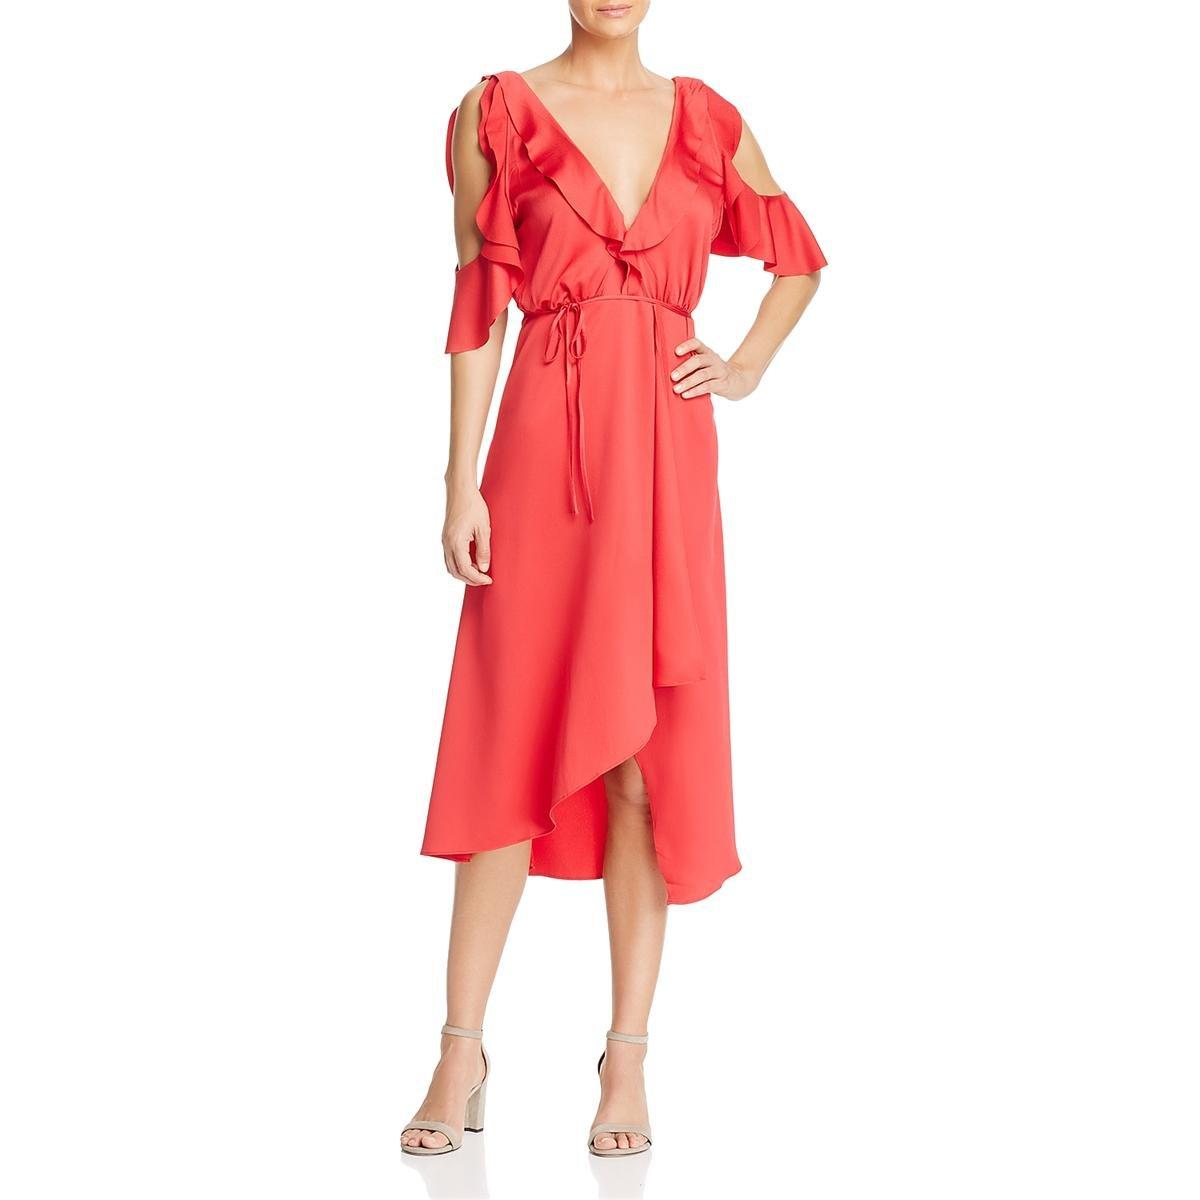 French Connection Women's Maudie Drape Dress, Watermelon, 6